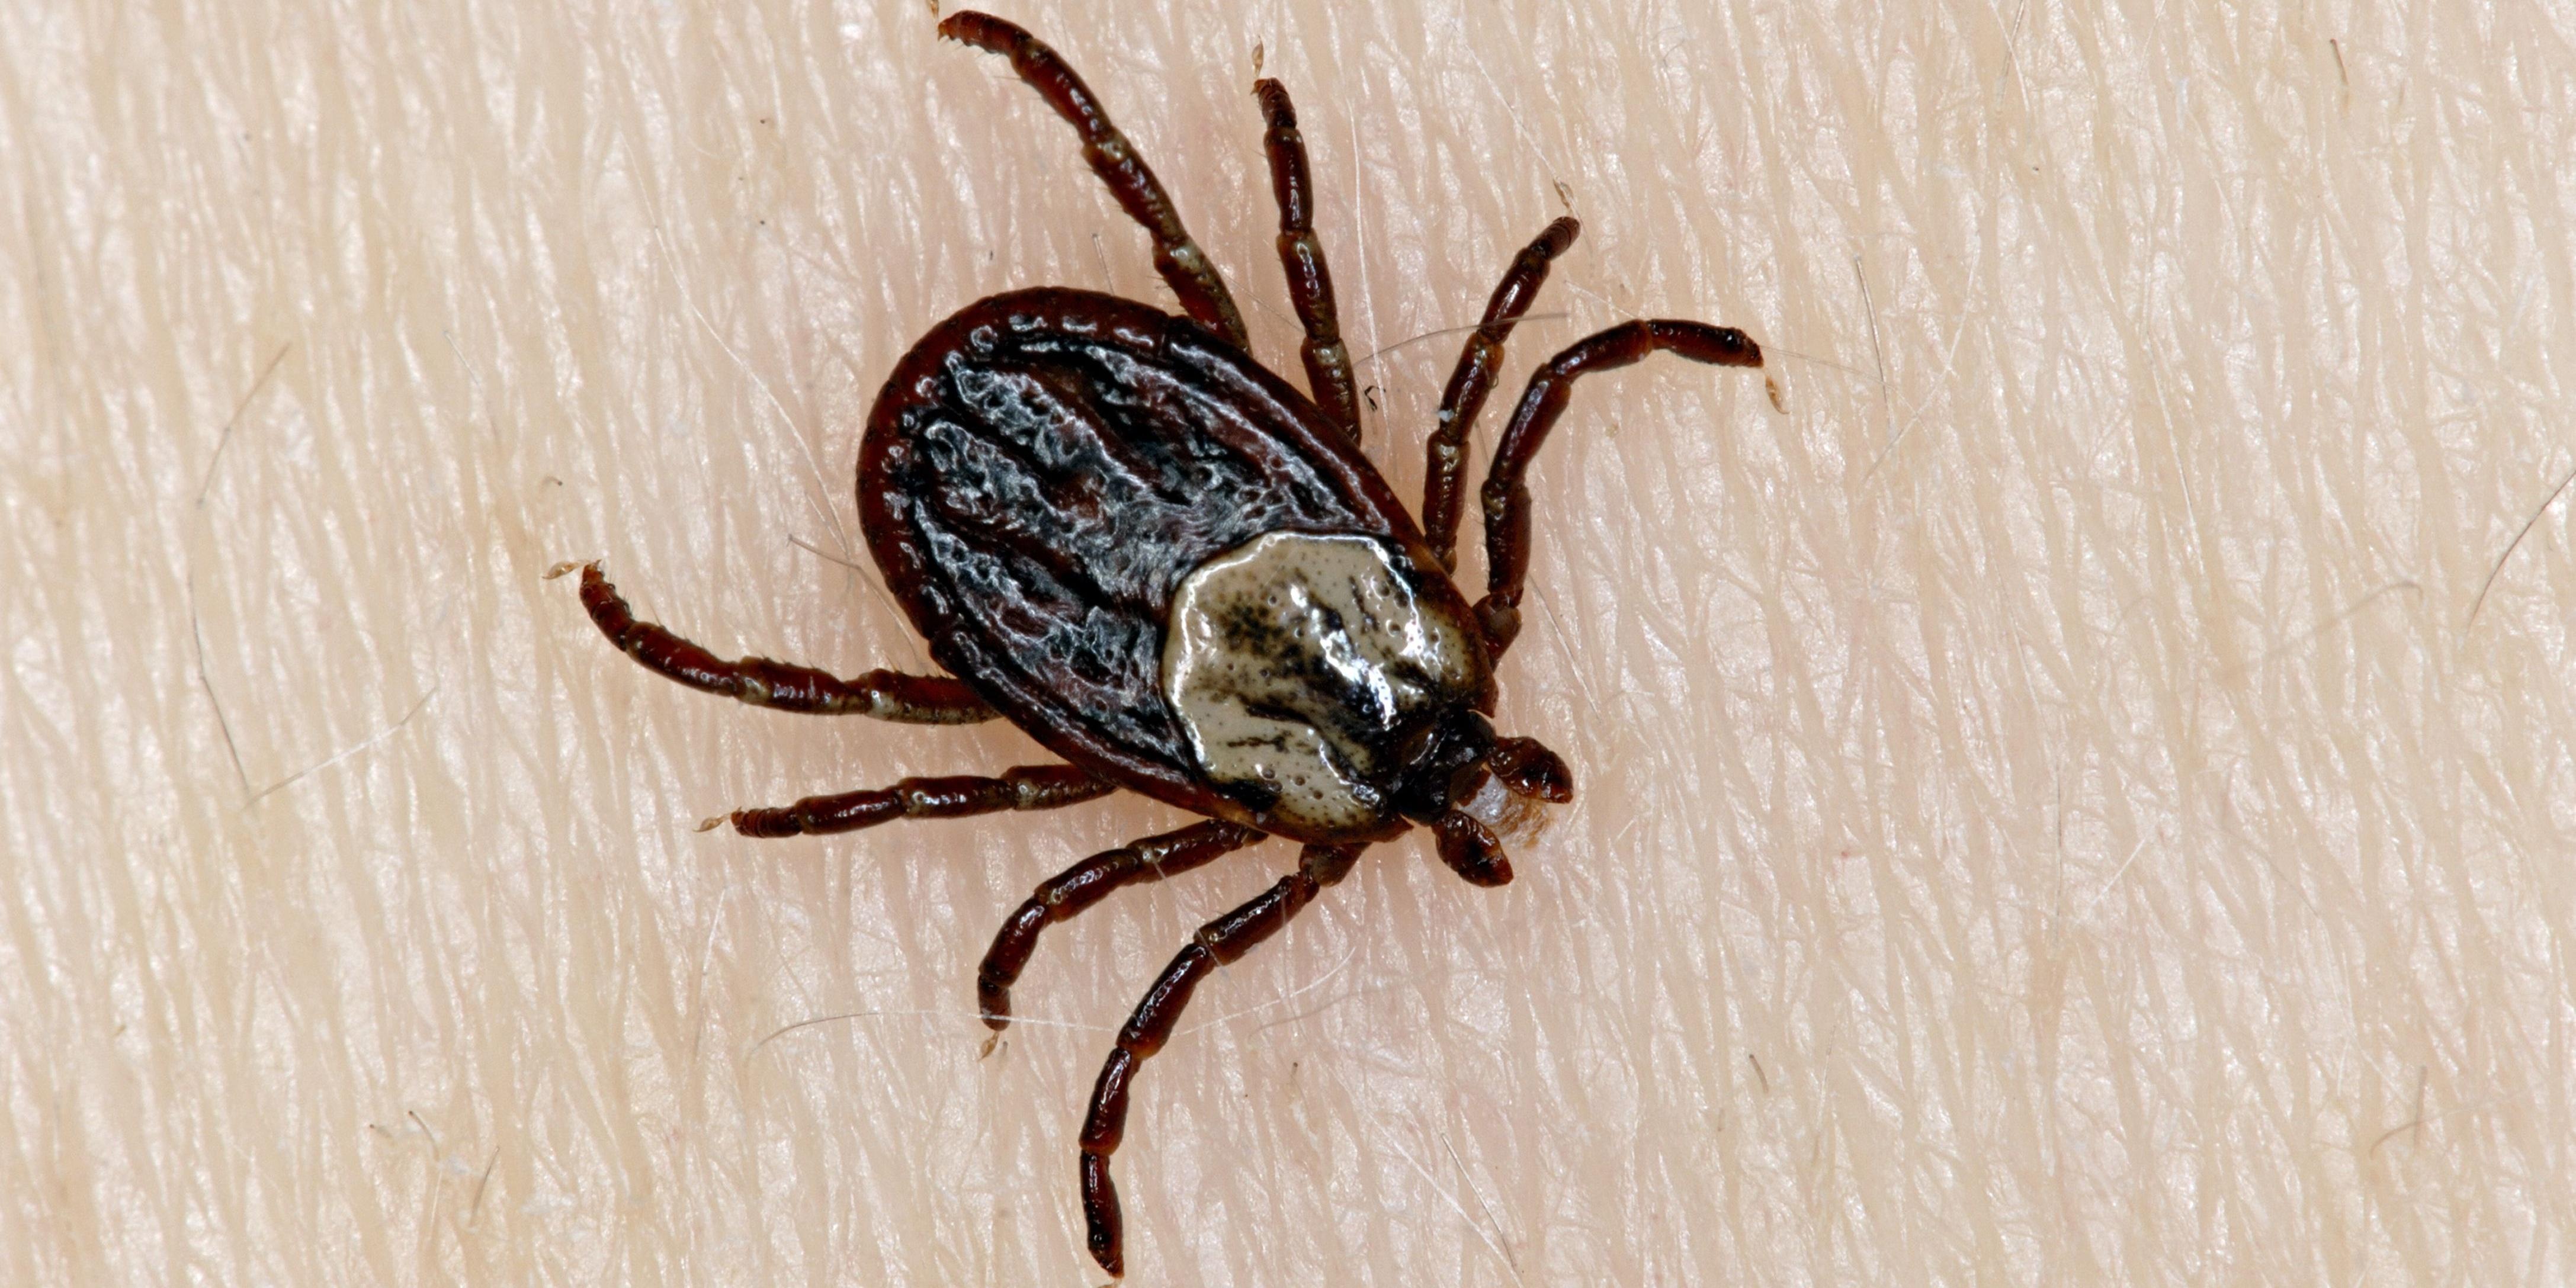 Ticks are arachnids